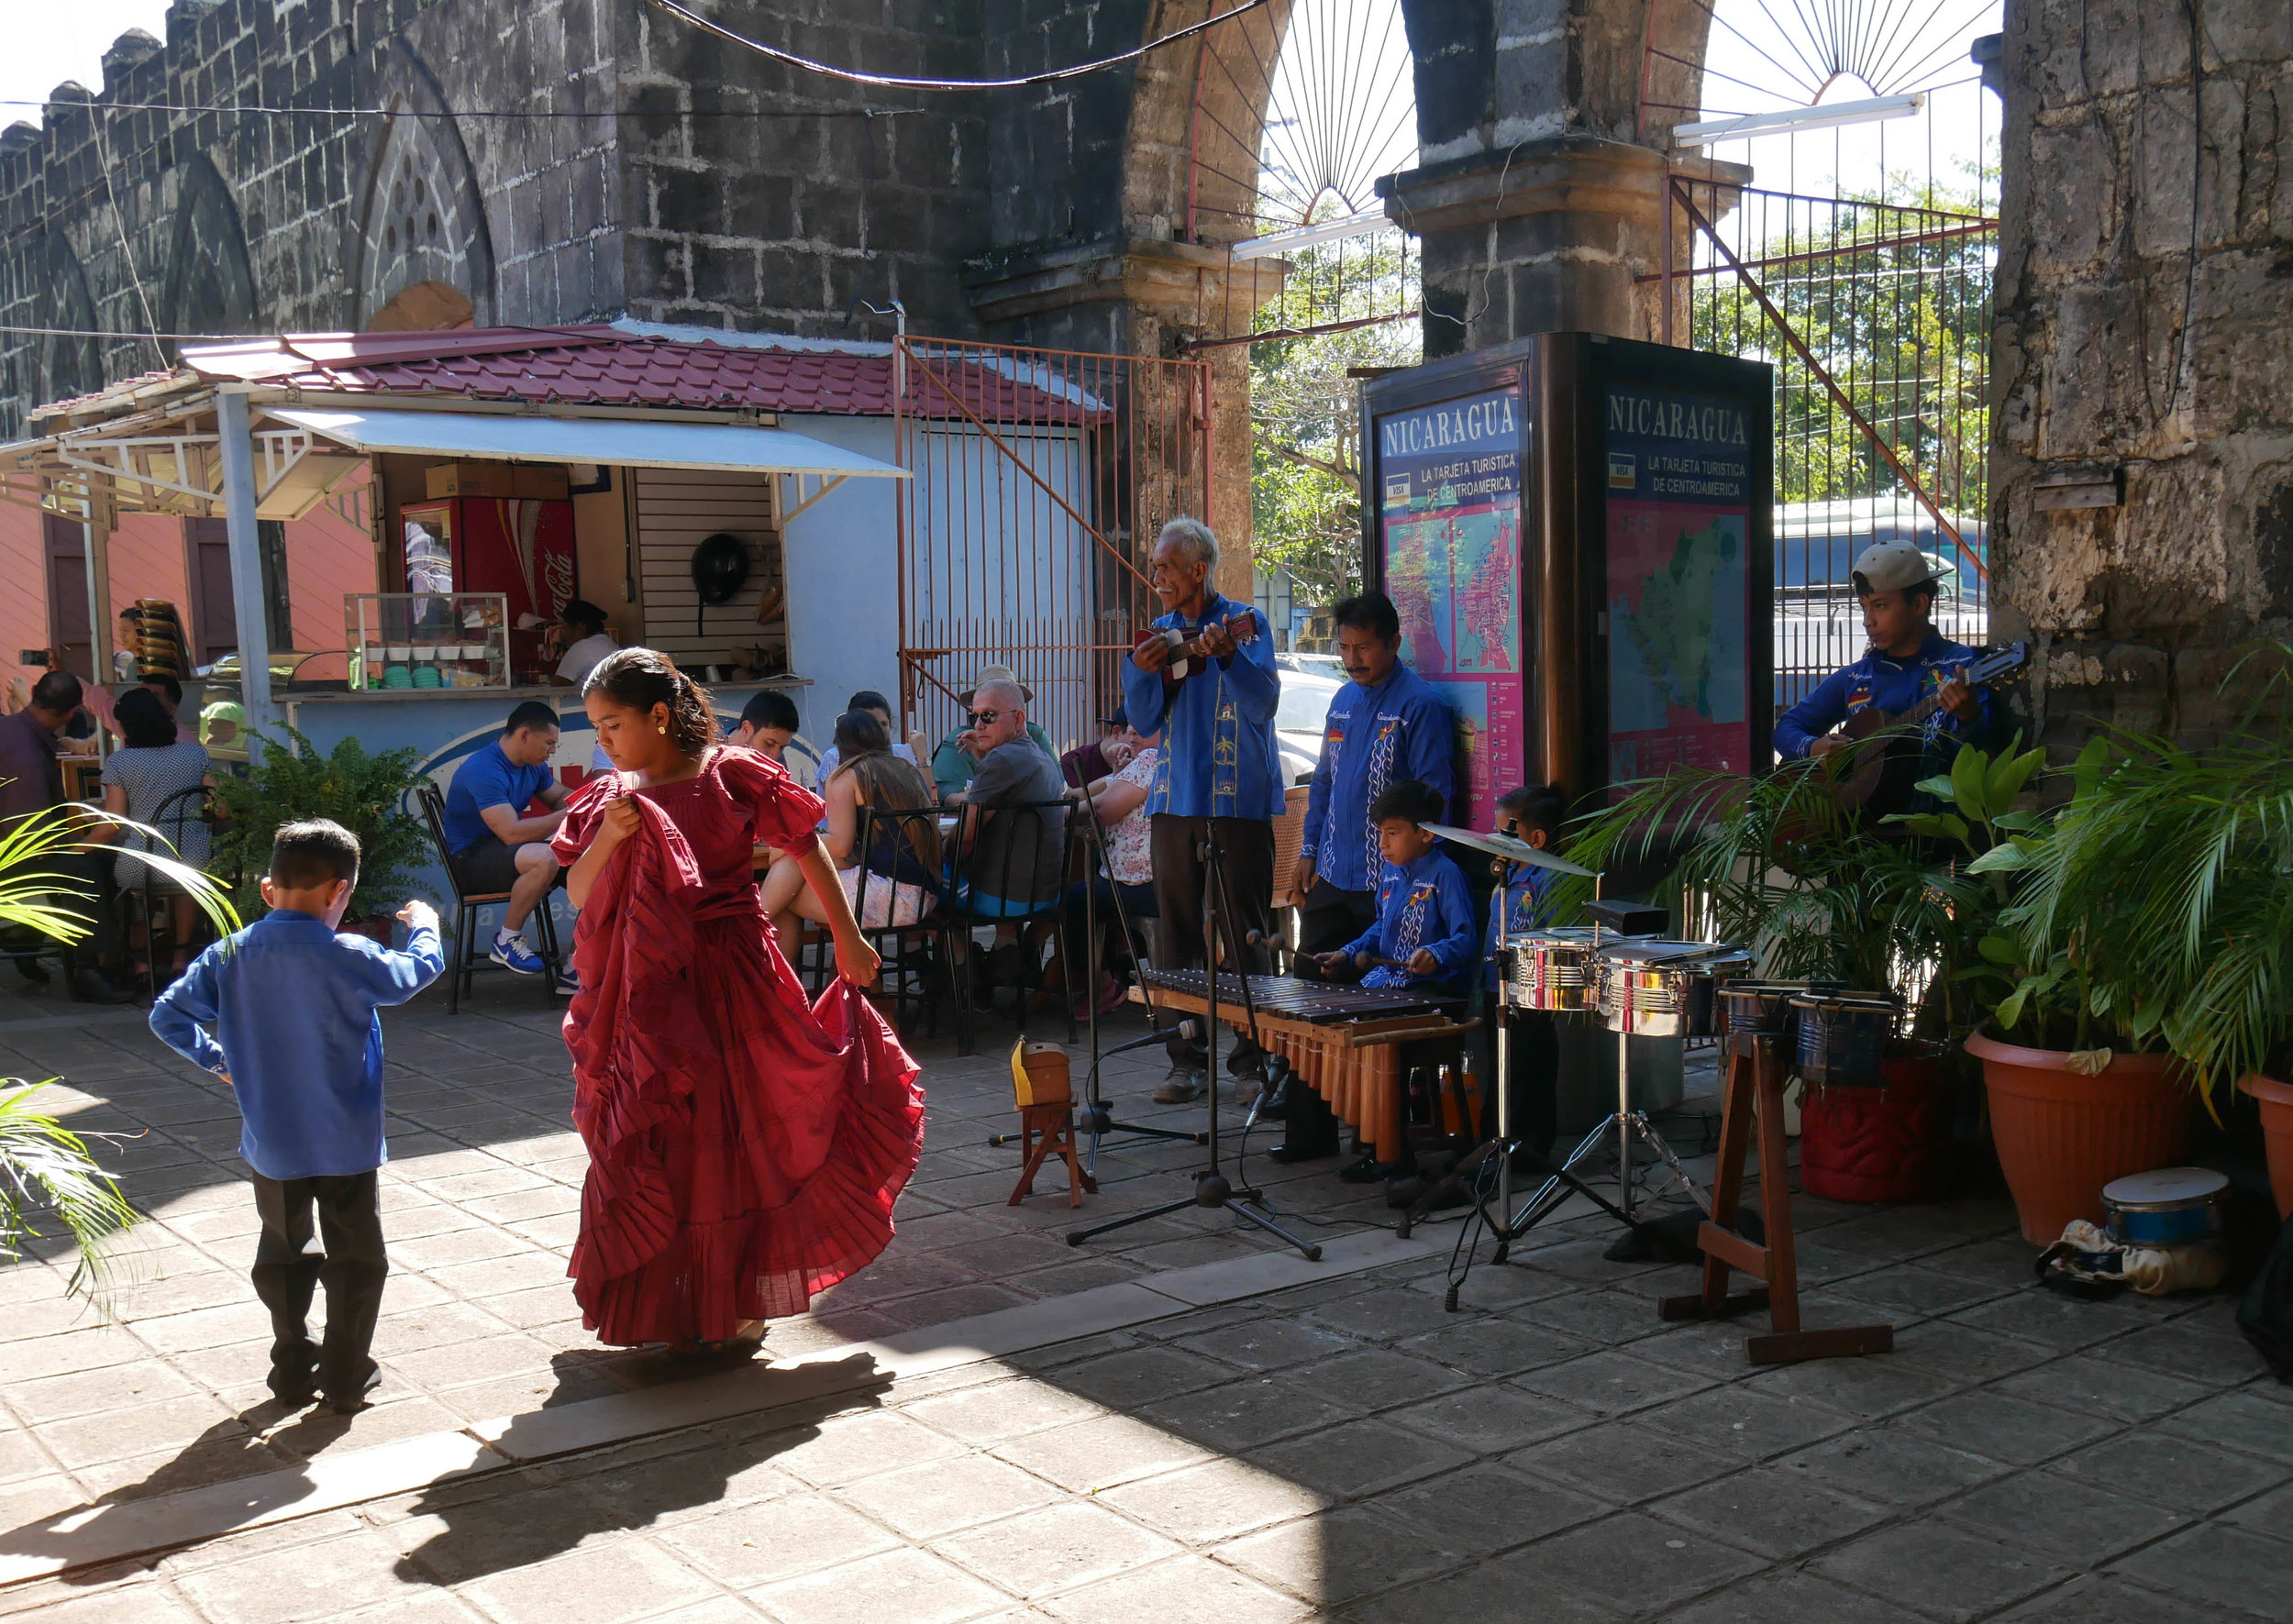 Traditional dance at the artisan market in Masaya